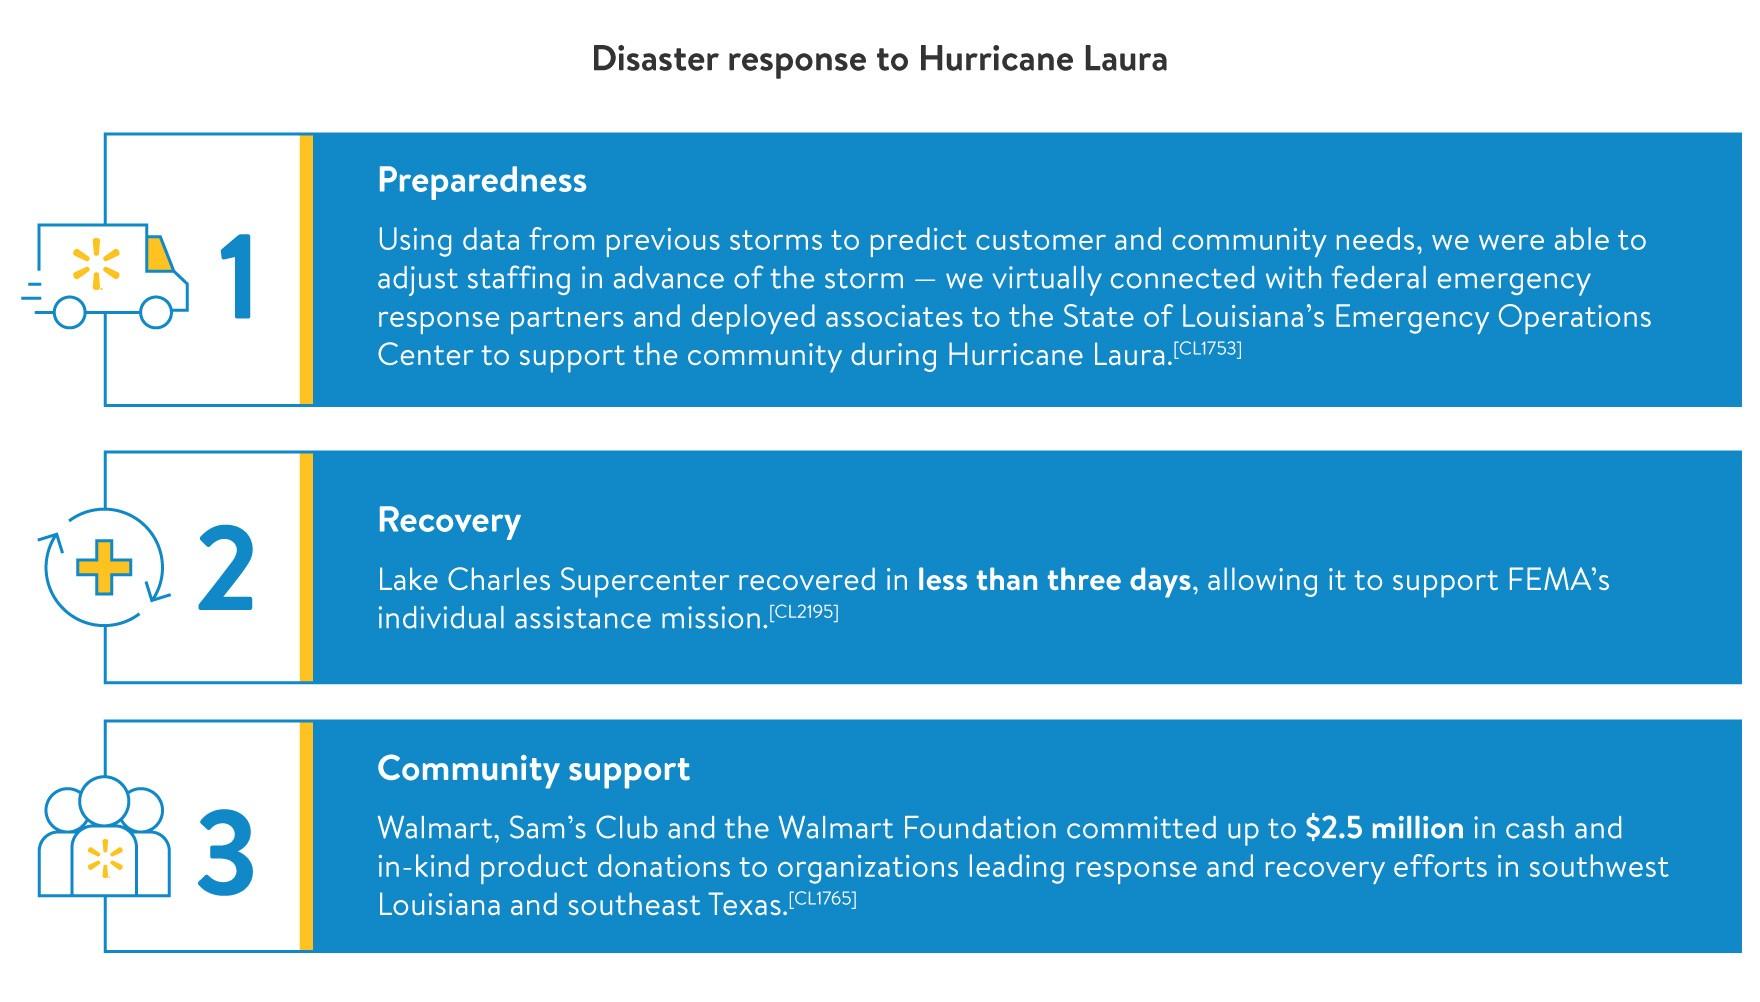 Disaster Response/hurricane-laura-response.jpg